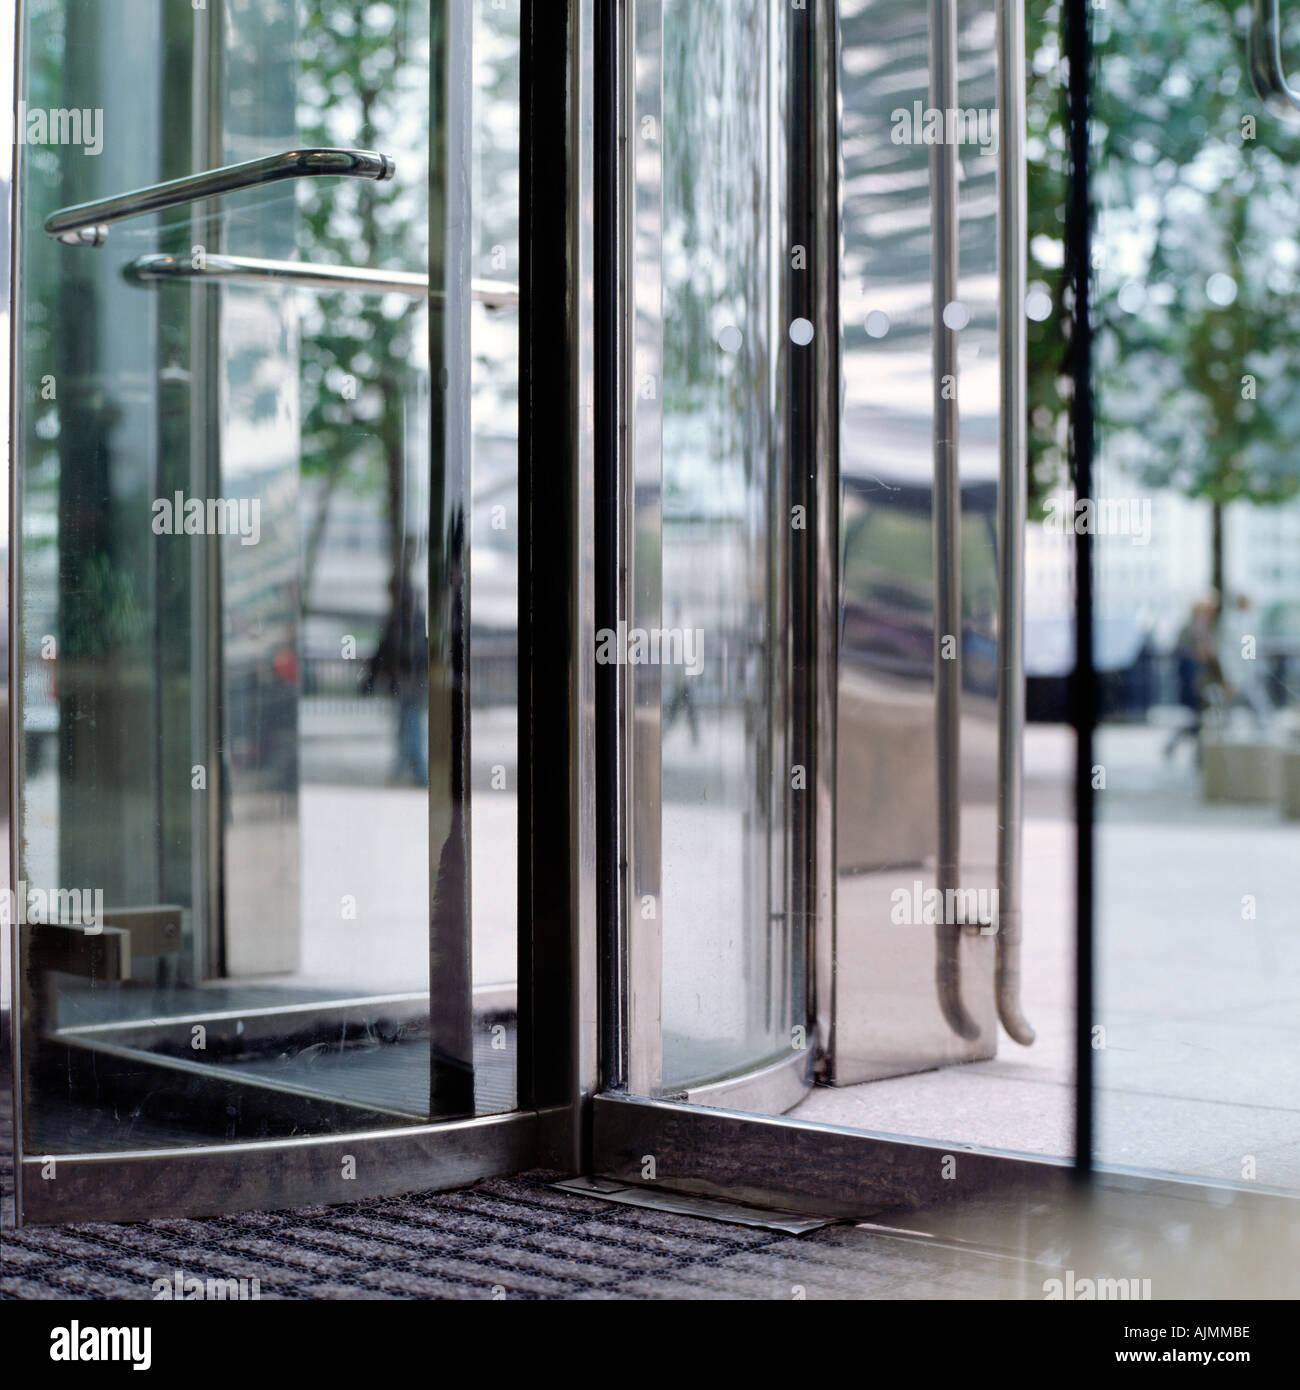 Revolving door - Stock Image & Glass Revolving Door Stock Photos u0026 Glass Revolving Door Stock ...